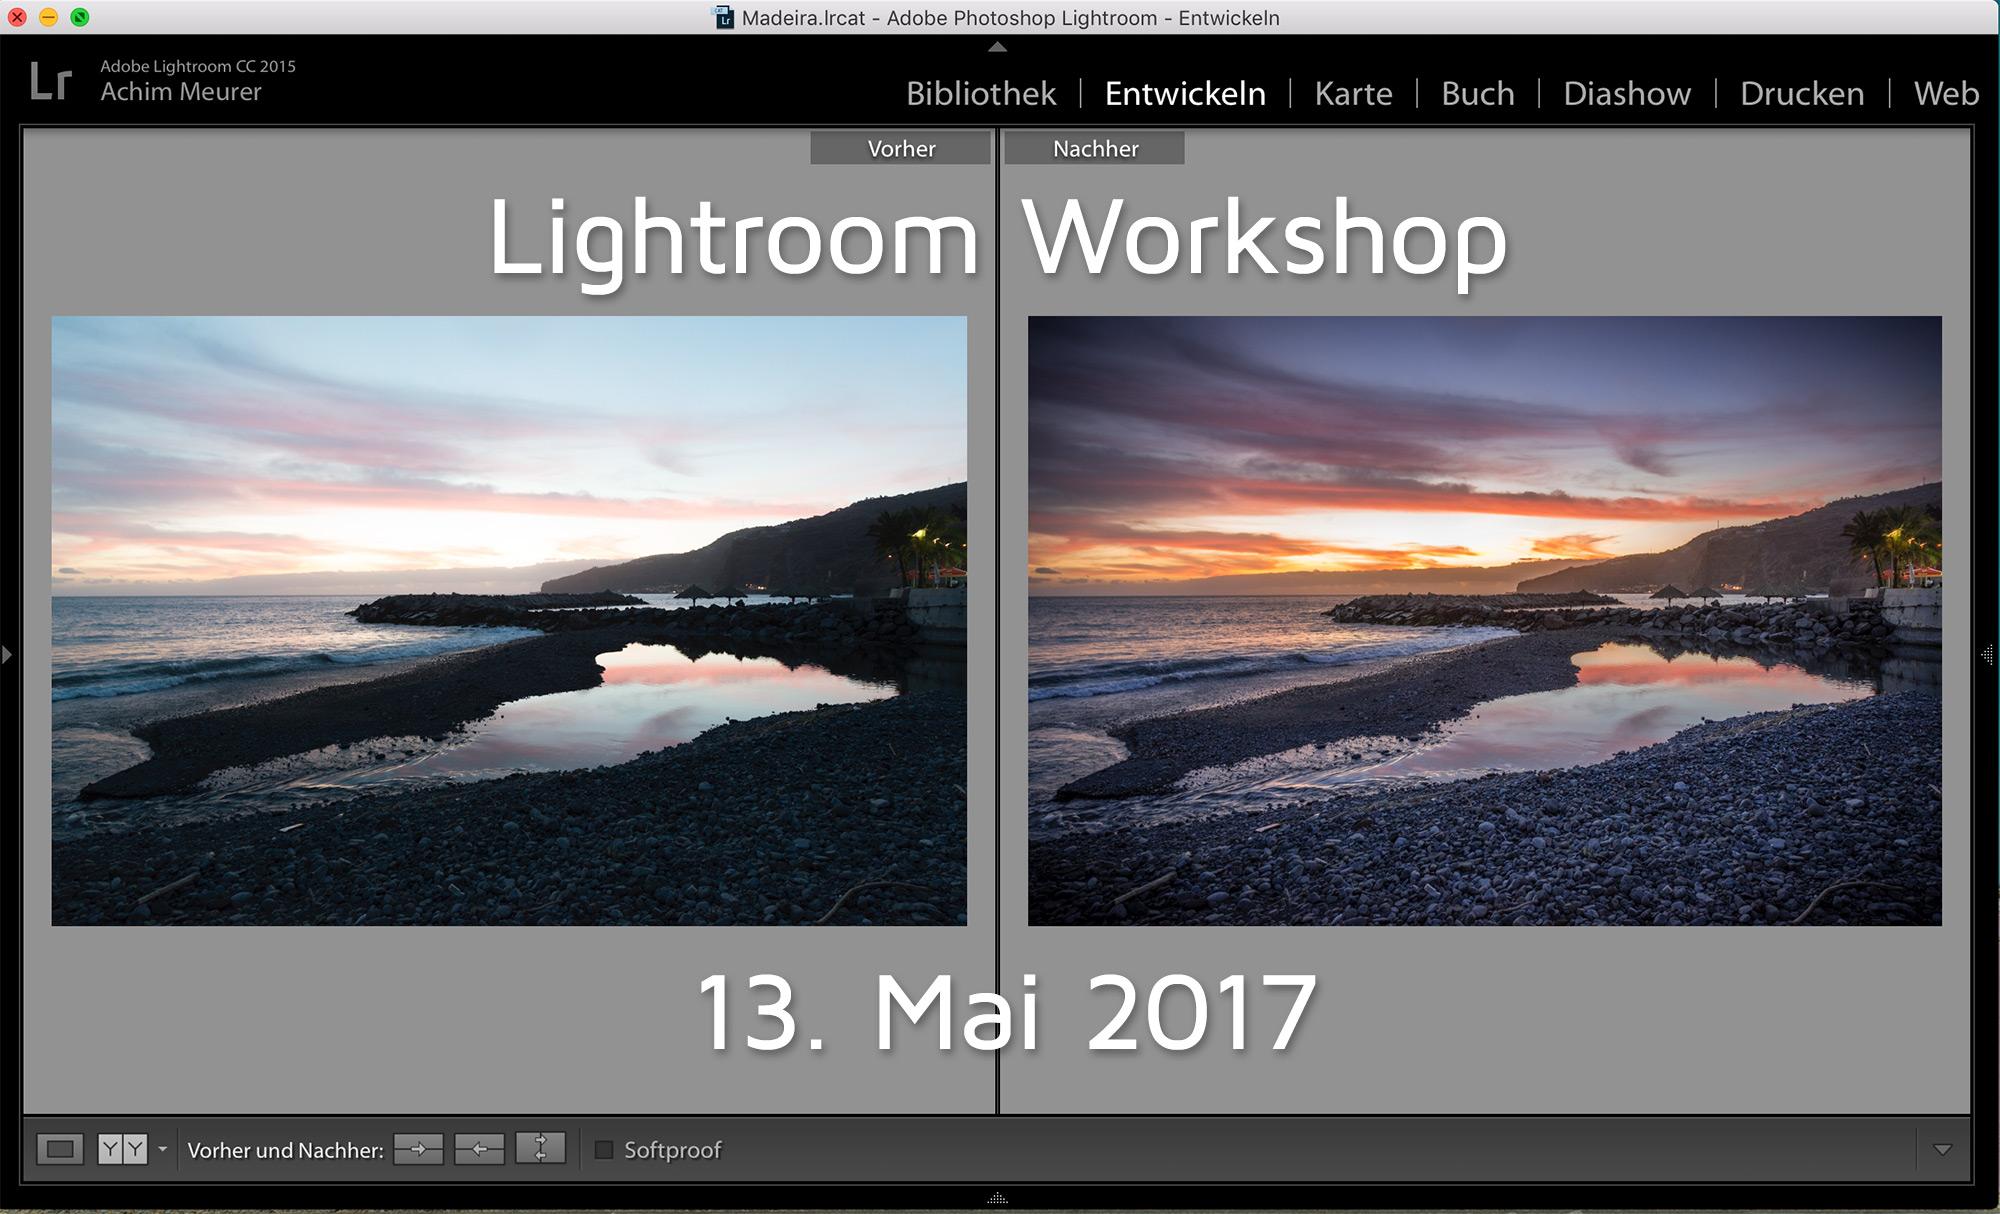 Lightroom Workshop mit Kochkurs